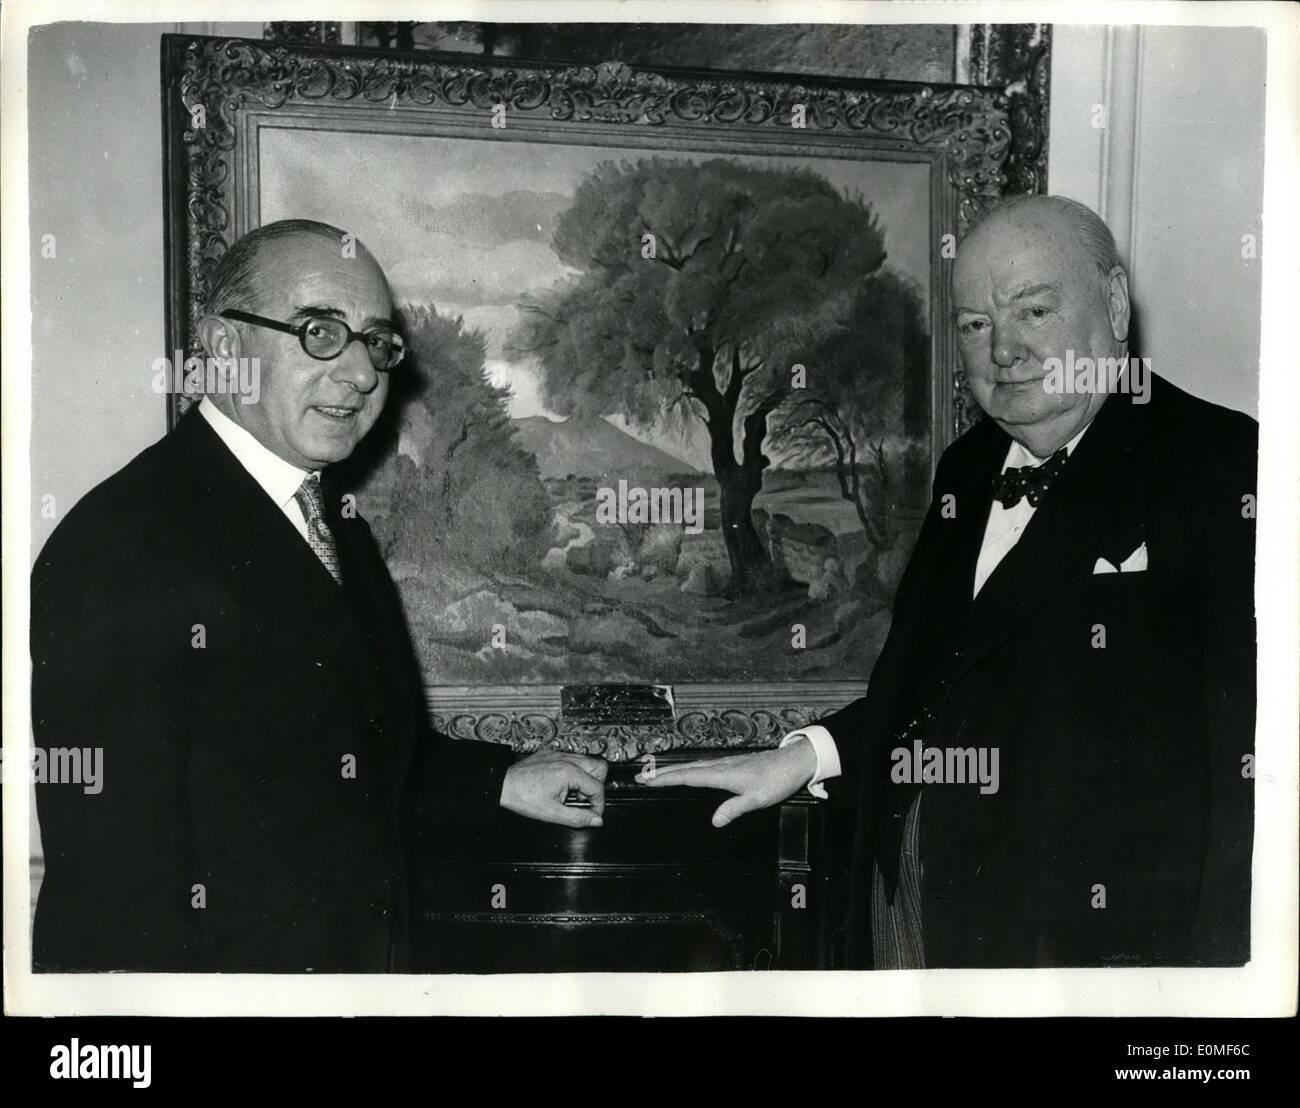 Pintura De Sir Winston Churchill Imágenes De Stock Pintura